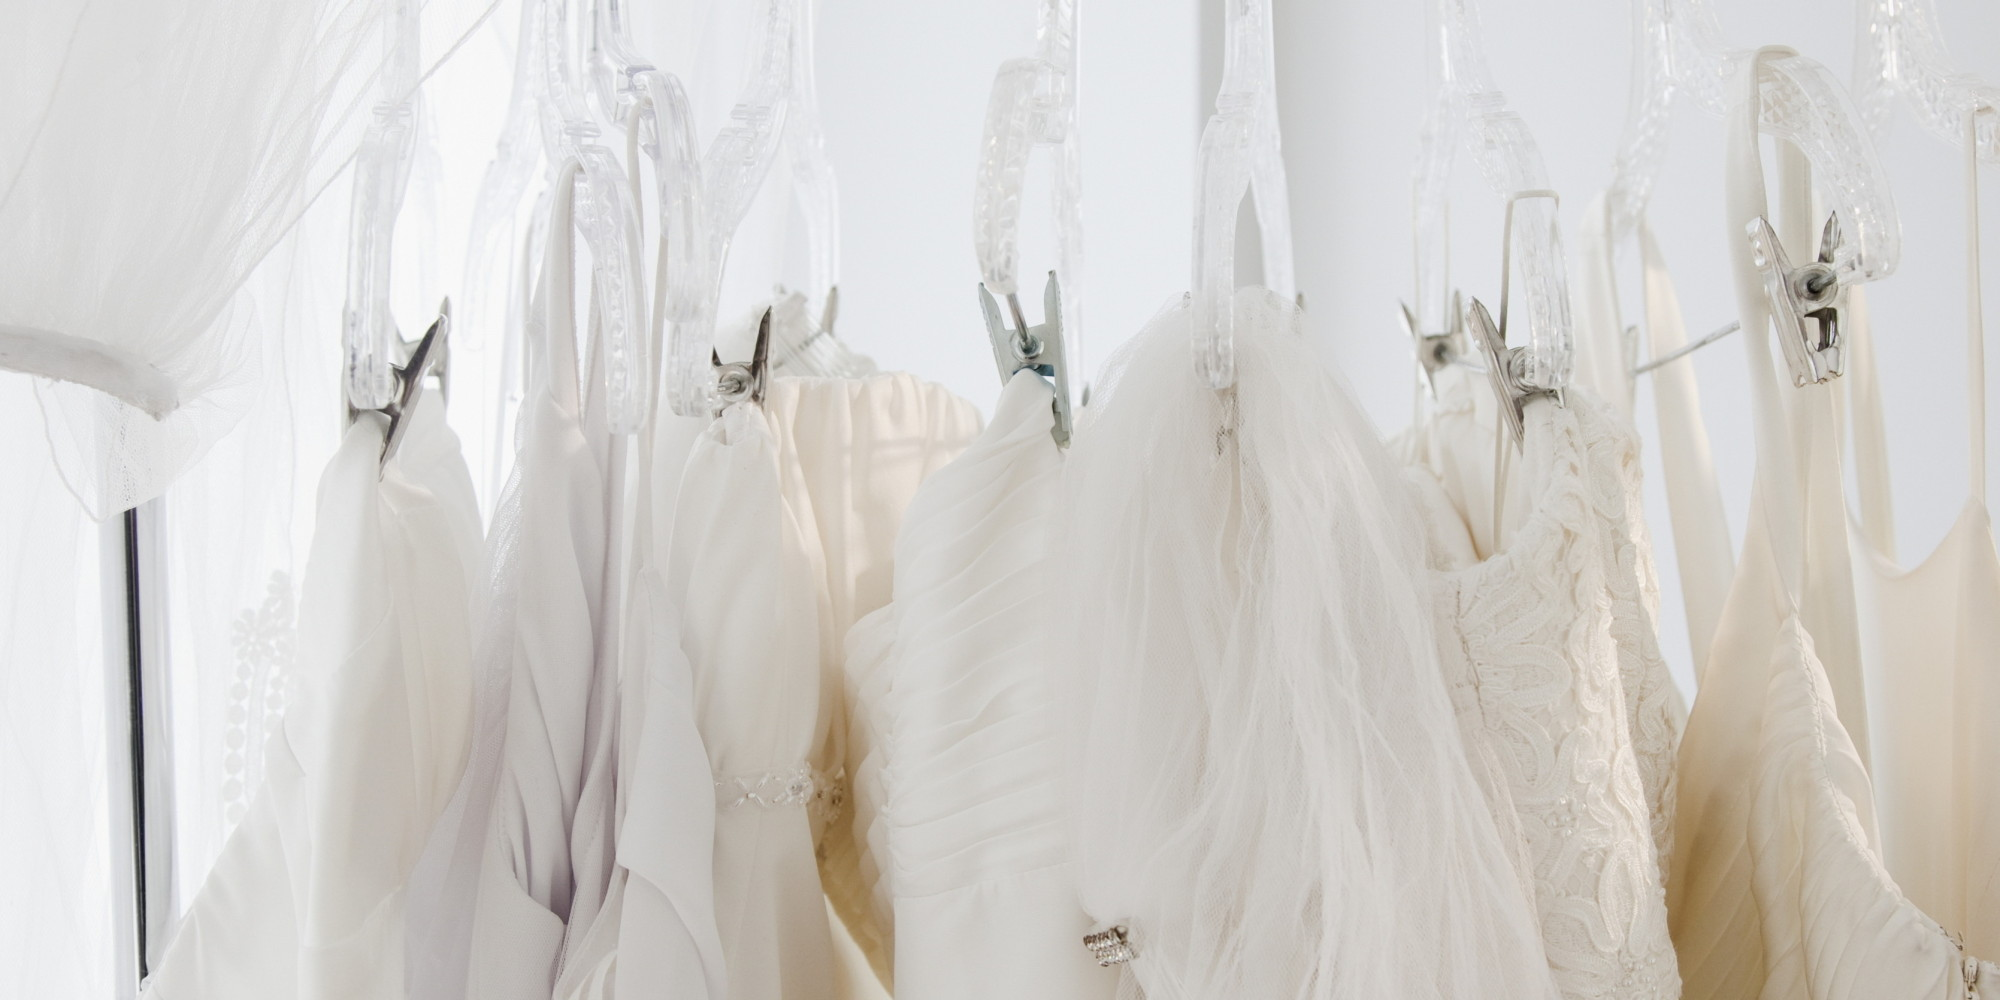 10 things no one tells you wedding dress b wedding dresses websites